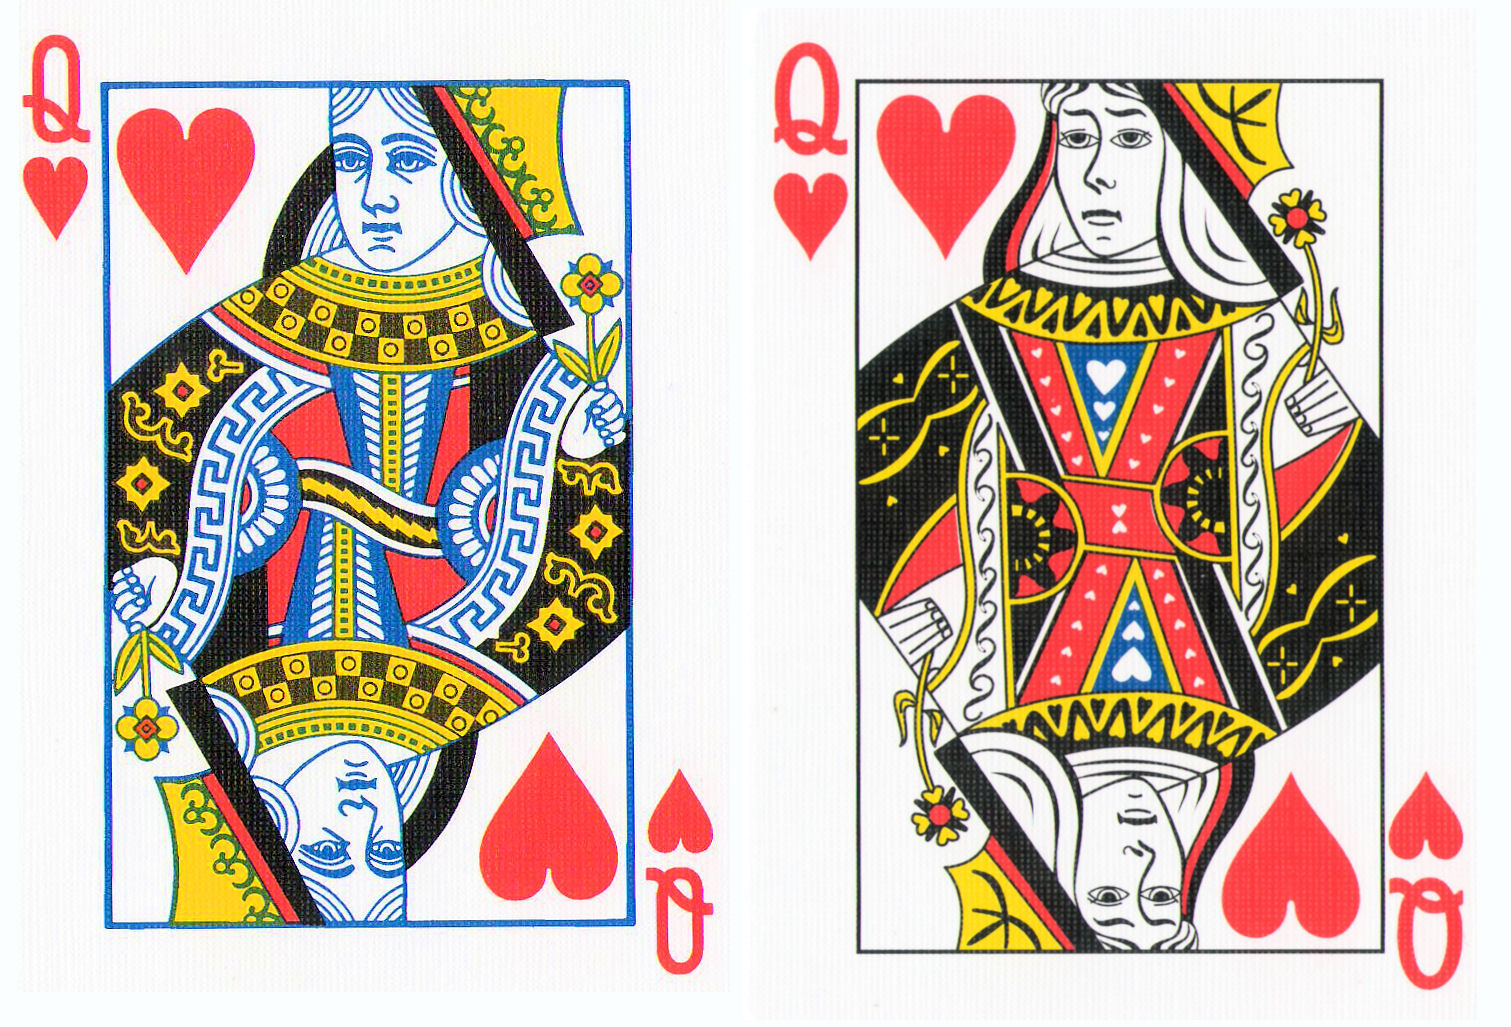 Hoyle casino classic 15